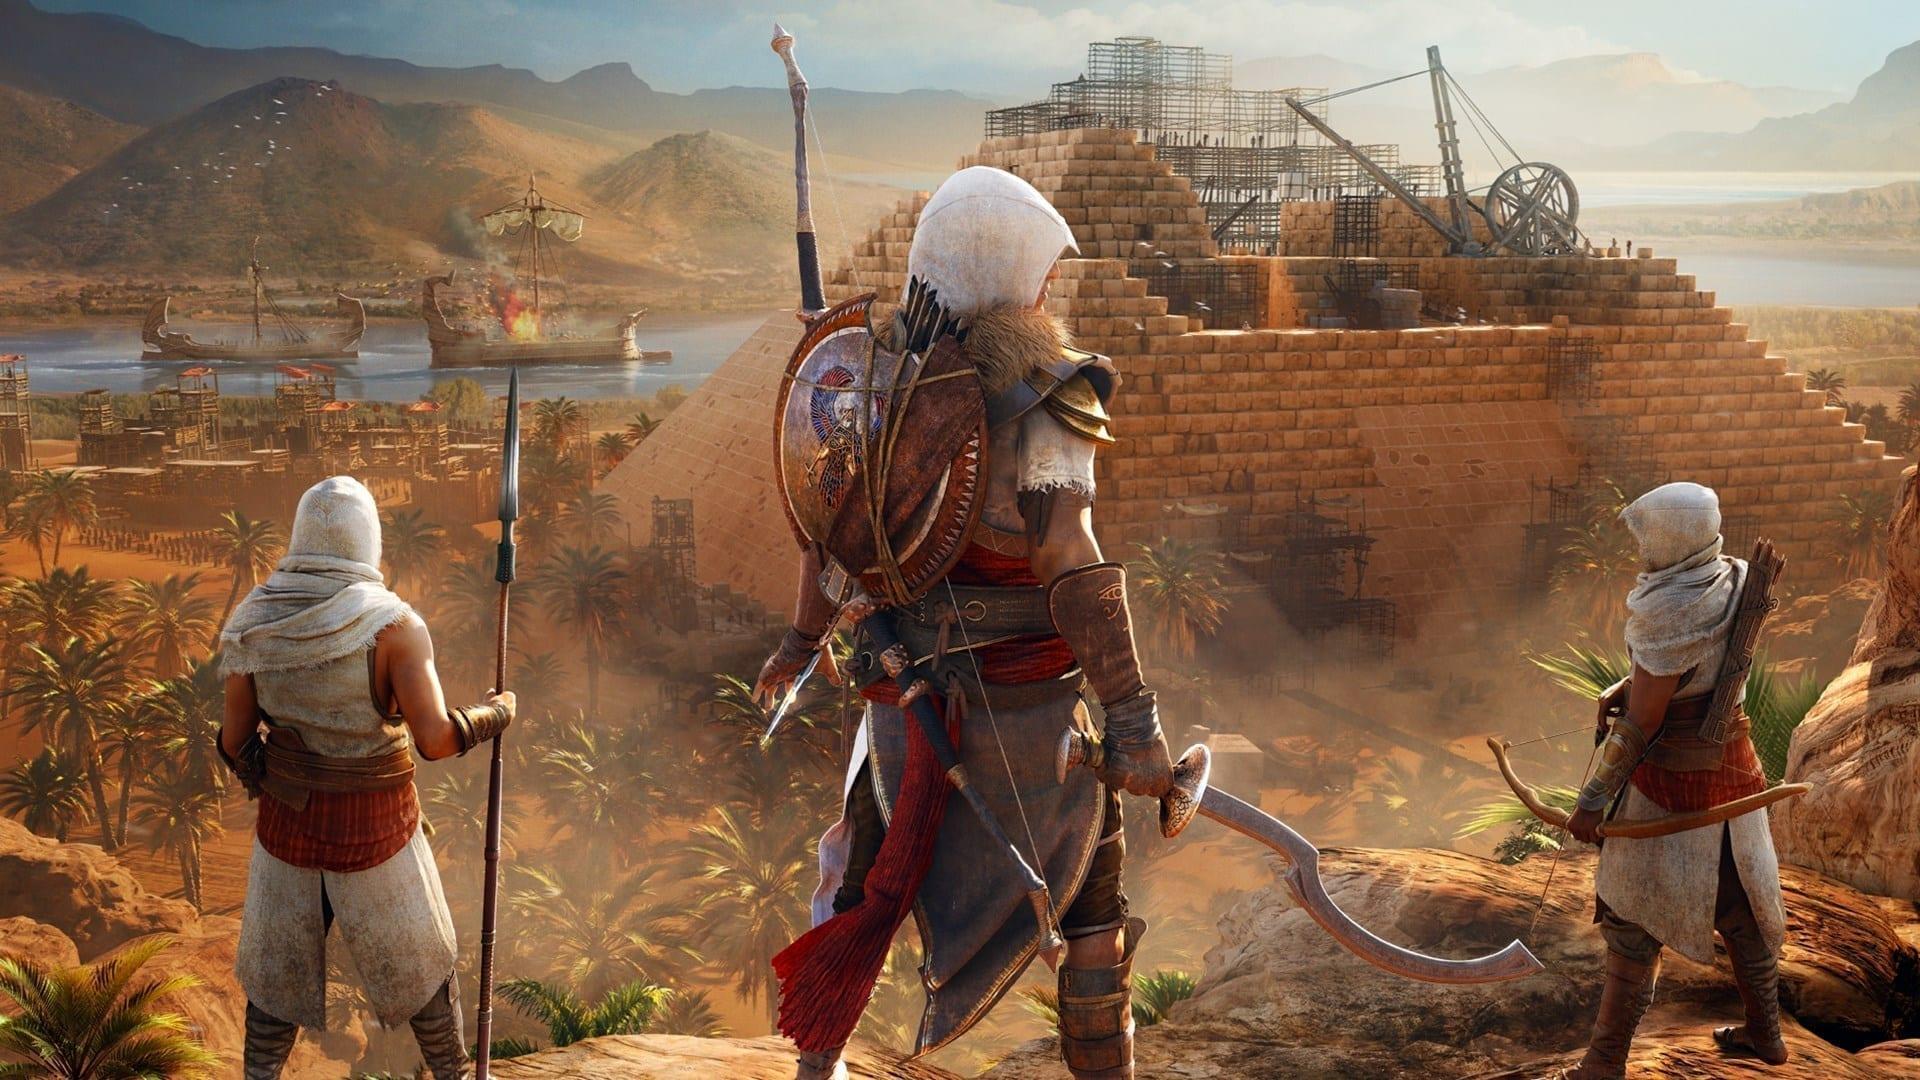 Screenshot aus dem Spiel Assassin's Creed Origins